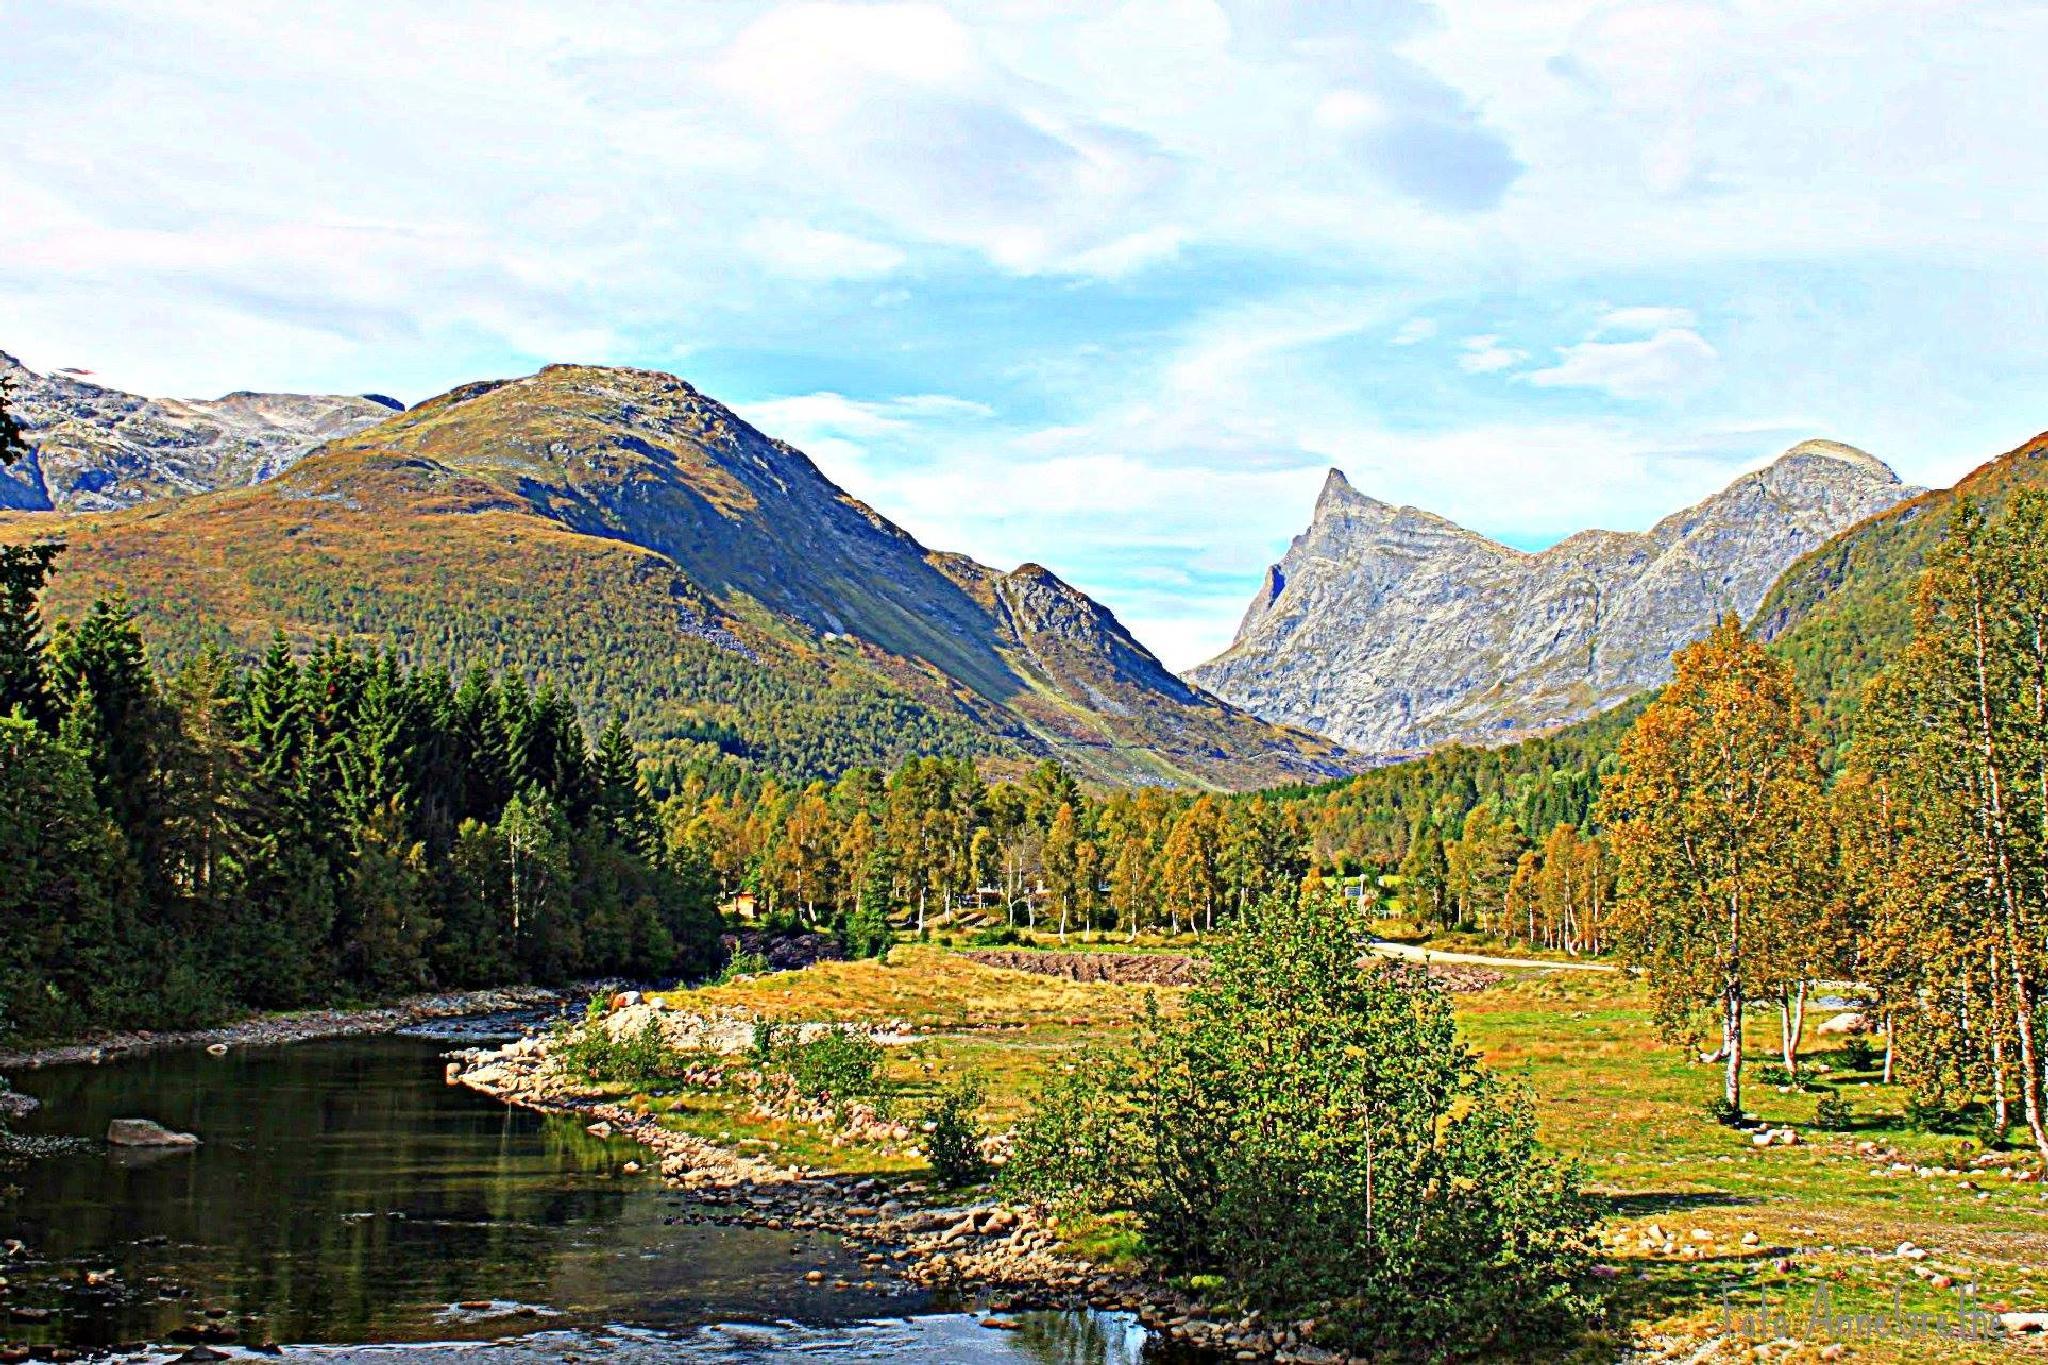 Norwegian landscape by Anne Grethe Eikrem